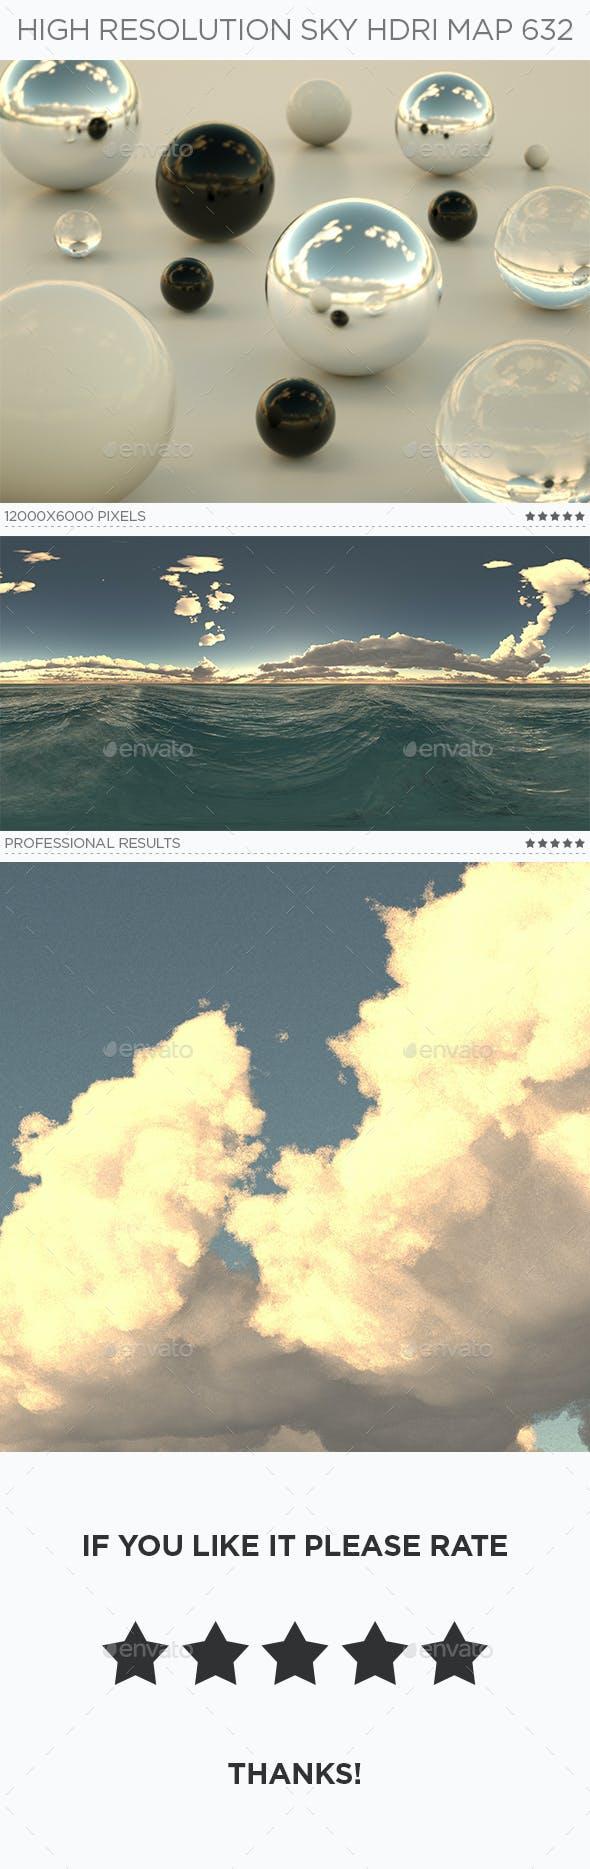 High Resolution Sky HDRi Map 632 - 3DOcean Item for Sale